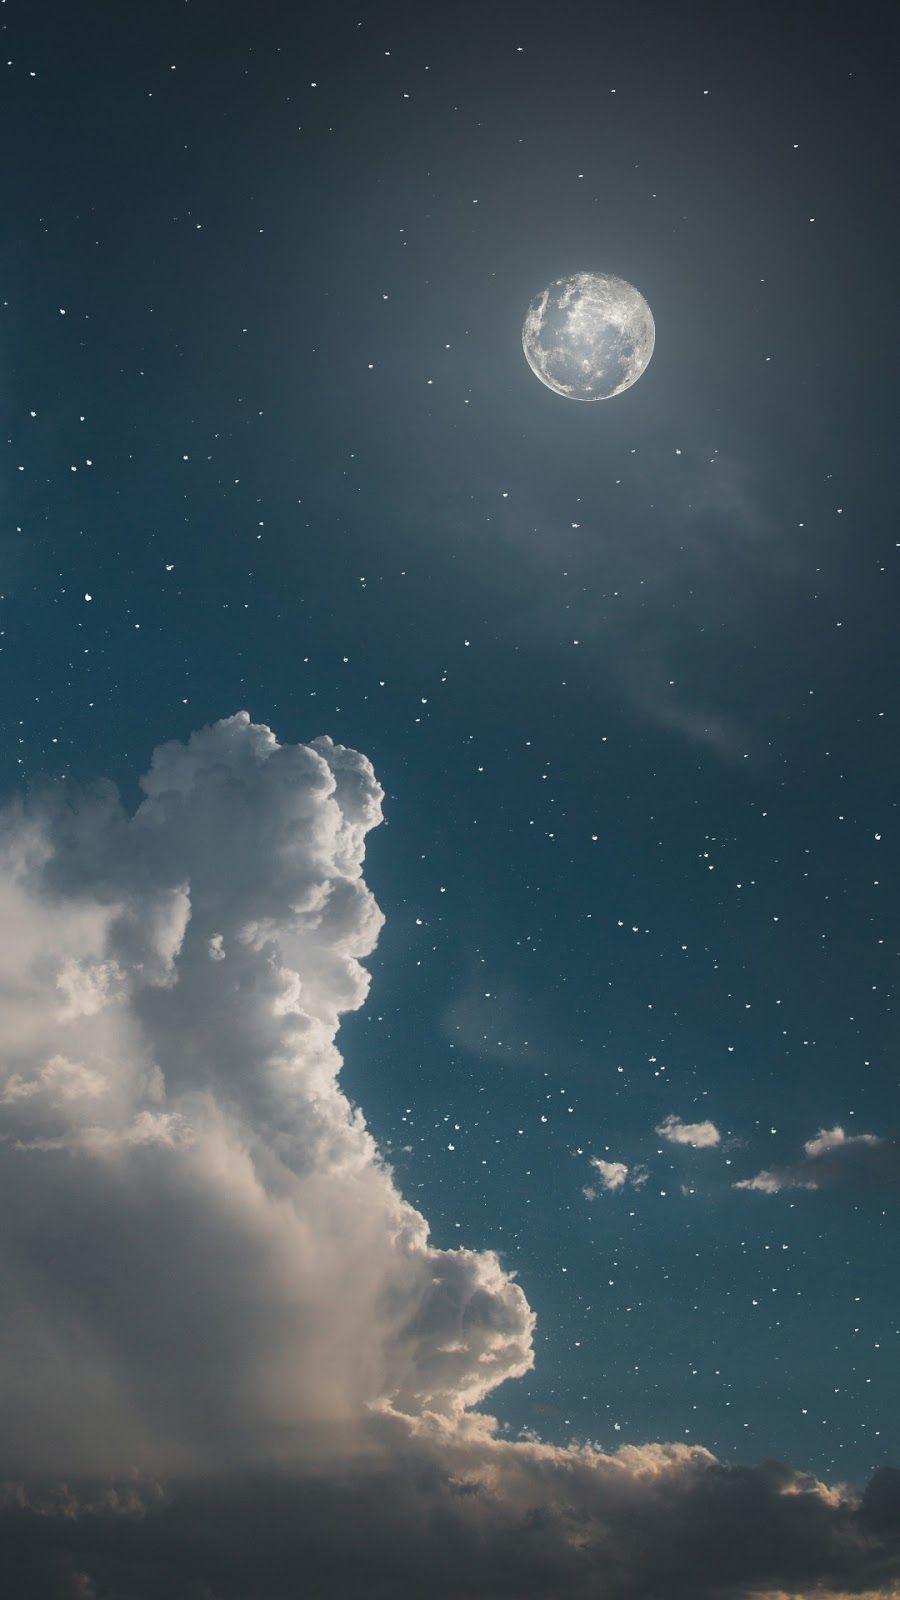 Night sky aesthetic wallpaper Пейзажи, Фоновые